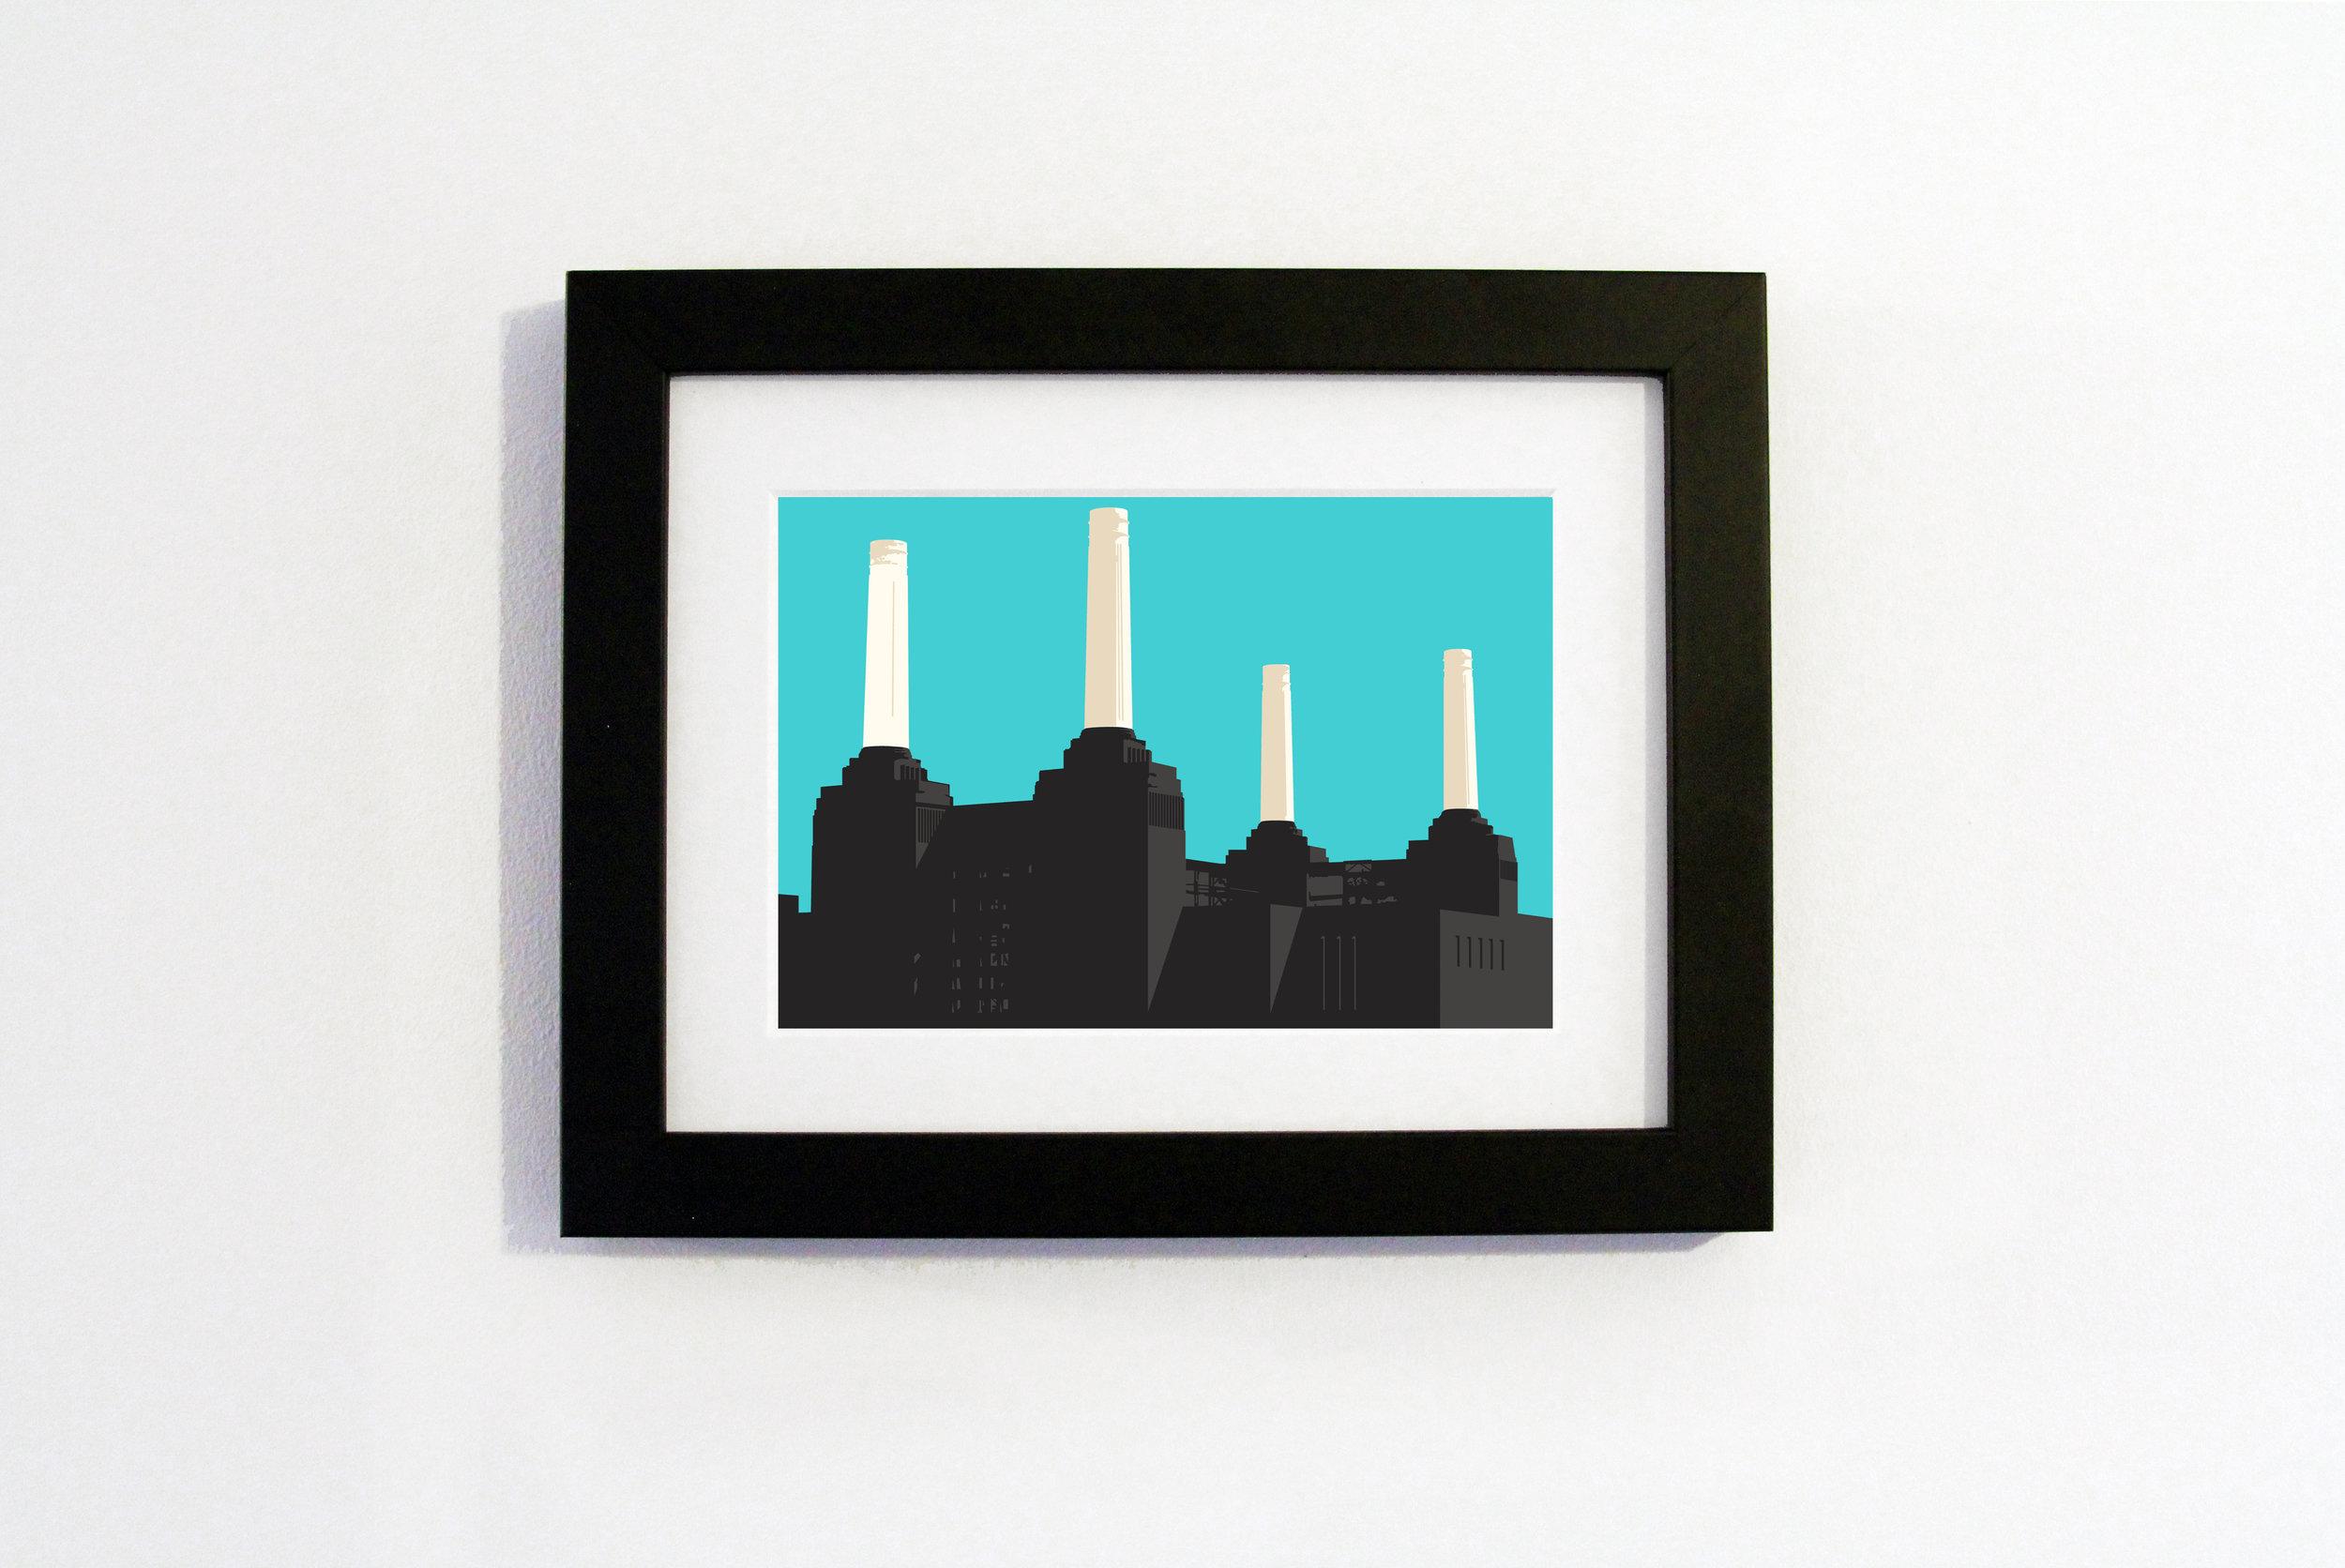 Battersea Blue Black Frame.jpg